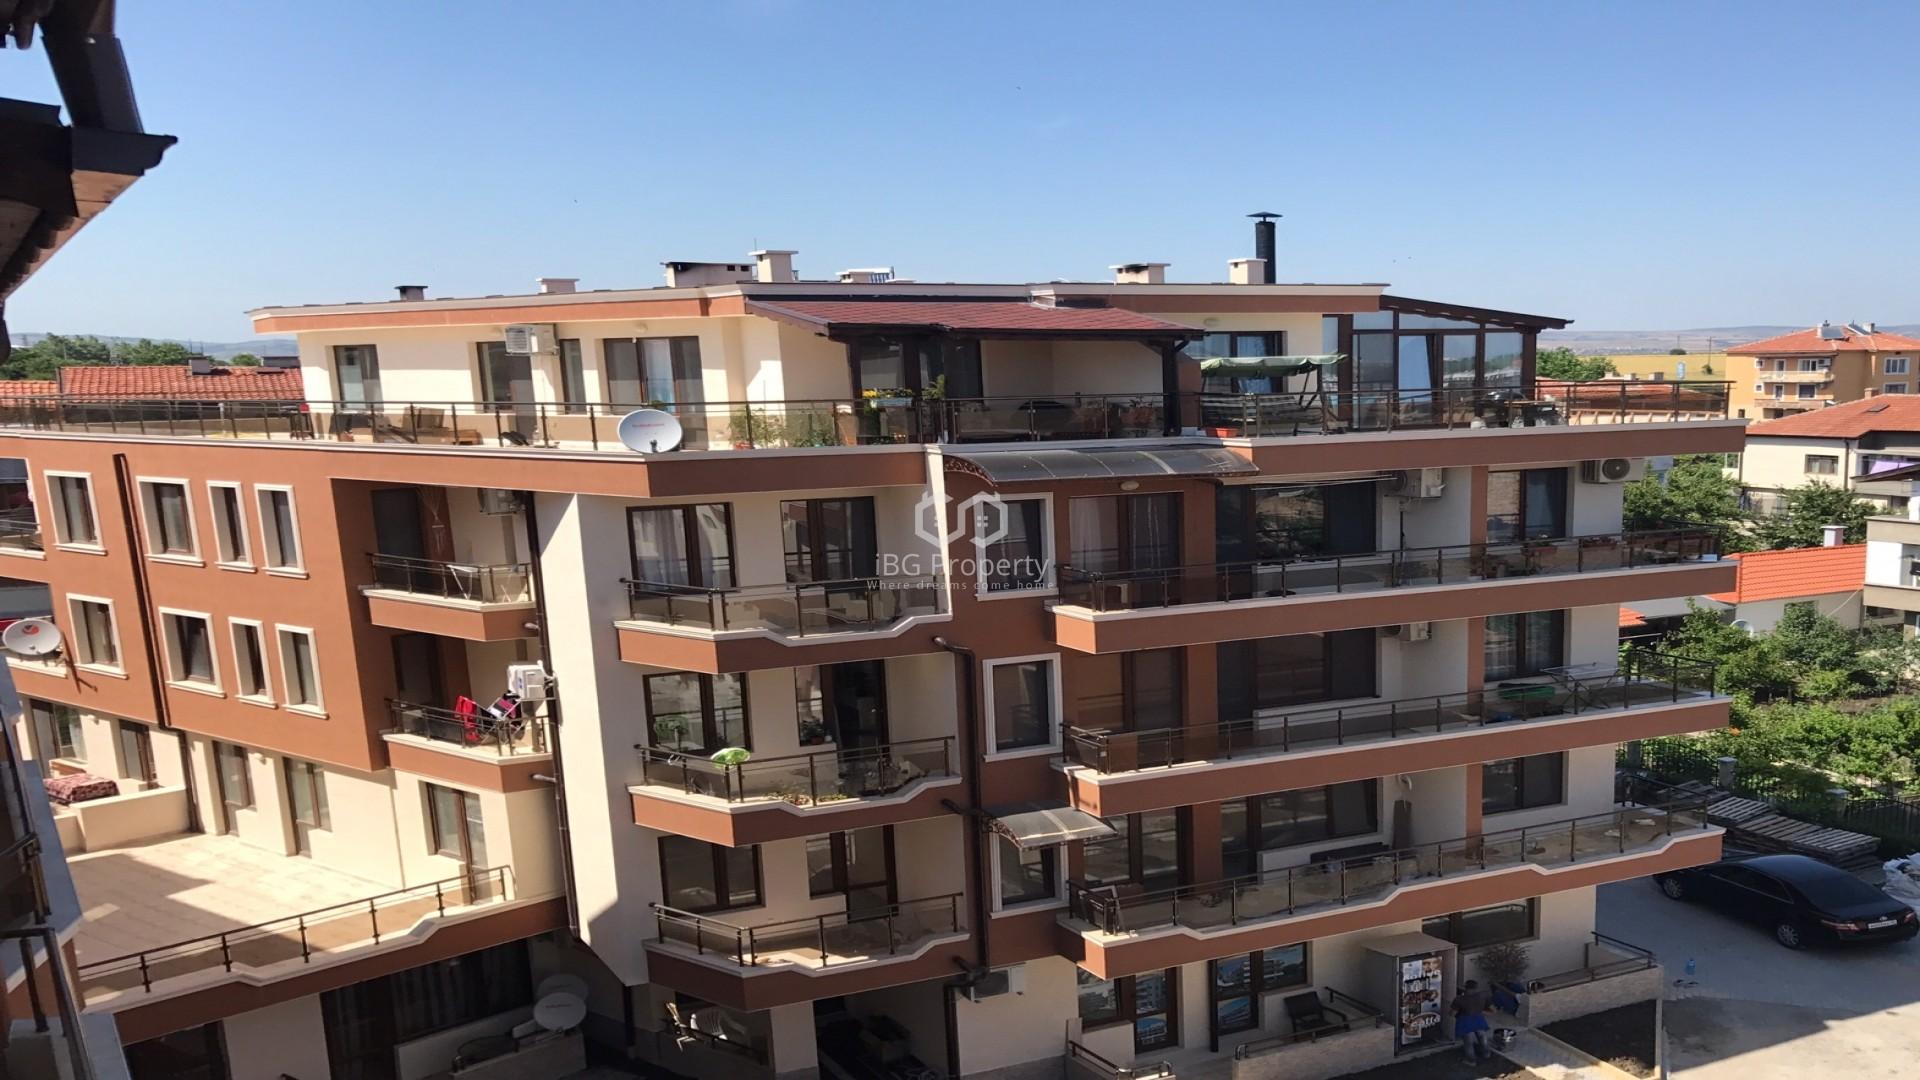 Двухкомнатная квартира Сарафово Бургас 53 m2